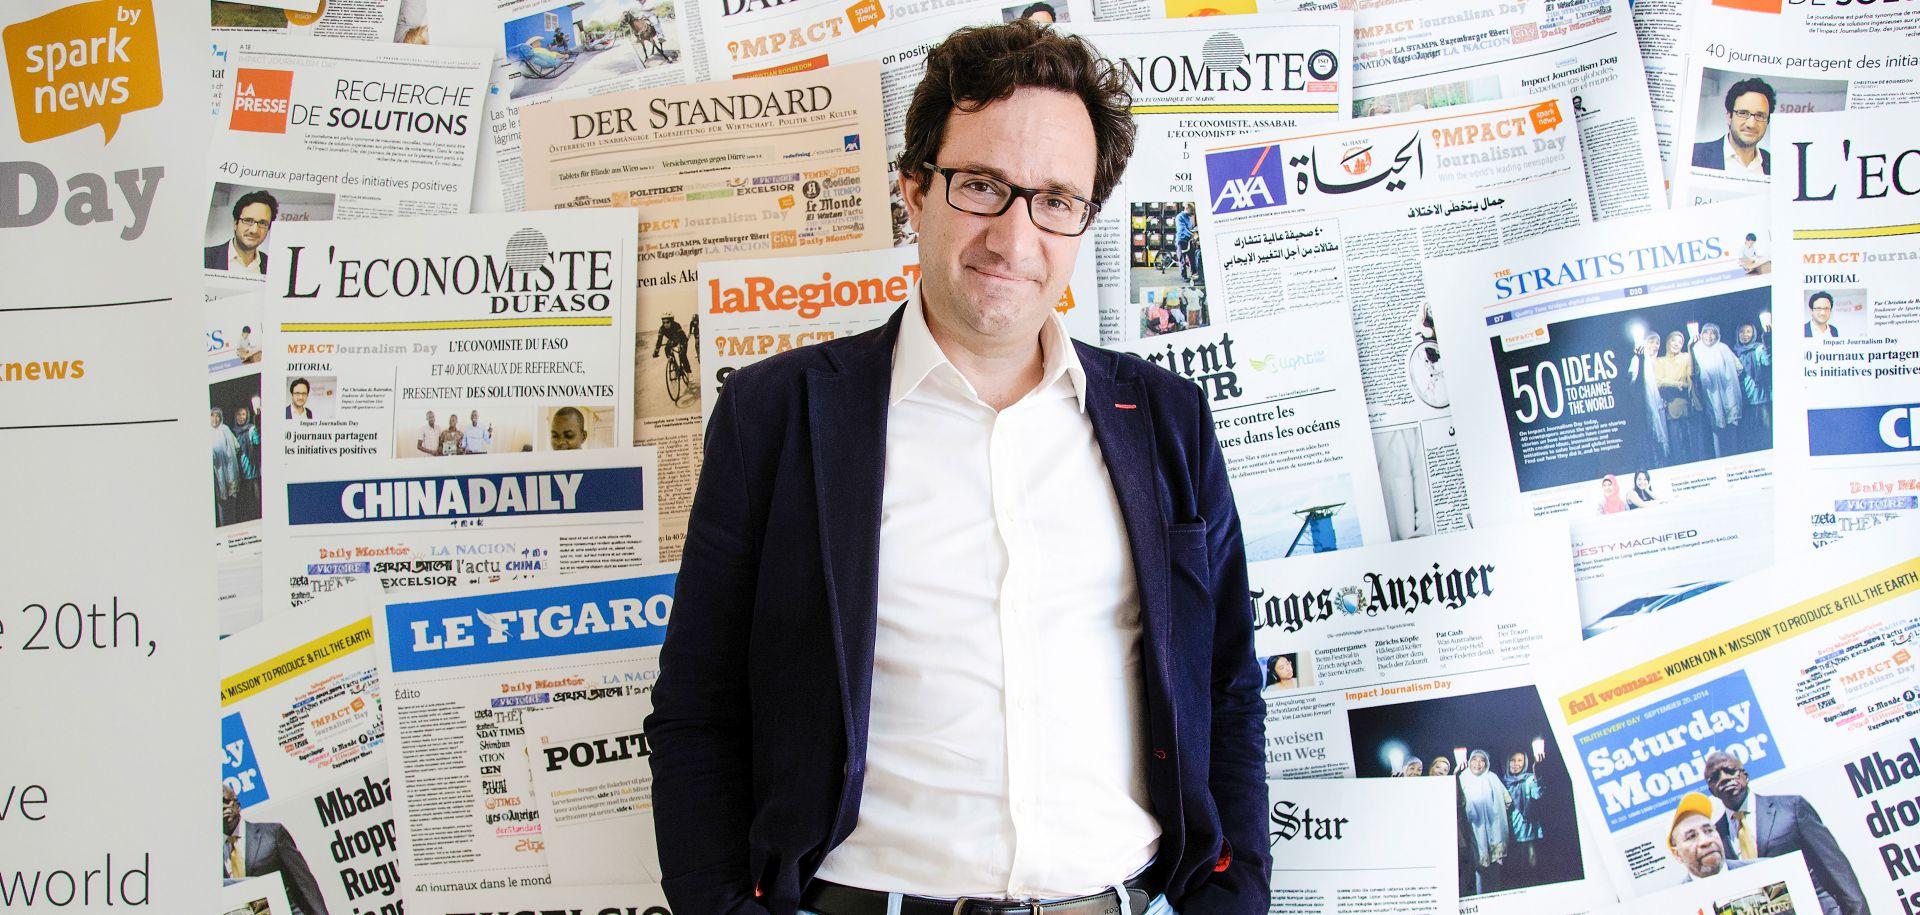 Christian de Boisredon, ideatore di Sparknew e Impact Journalism Day.